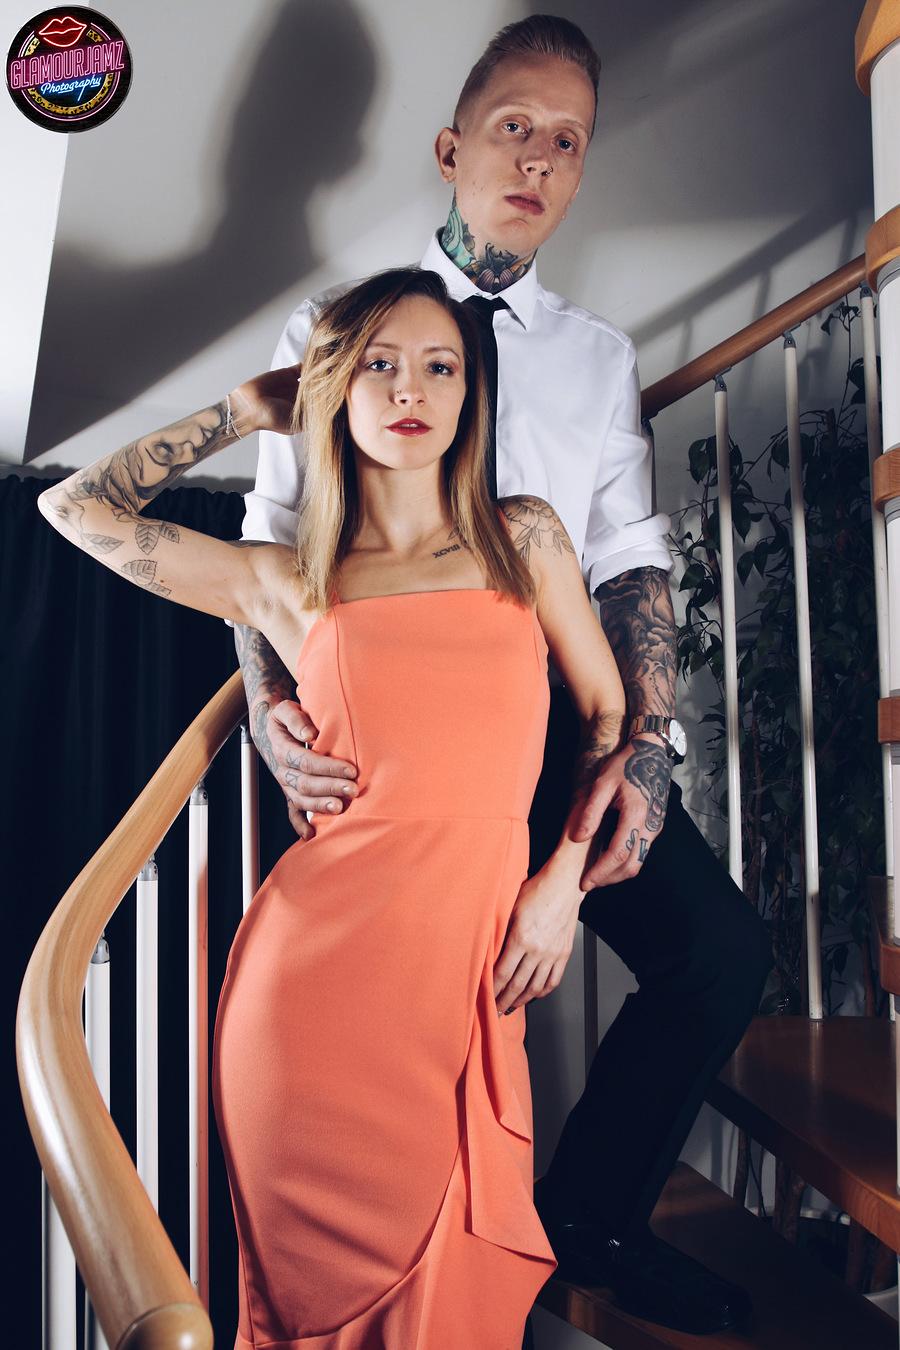 Photography by GlamourJamz Photography, Models CJlock, Models WOLFY / Uploaded 12th November 2019 @ 10:41 PM